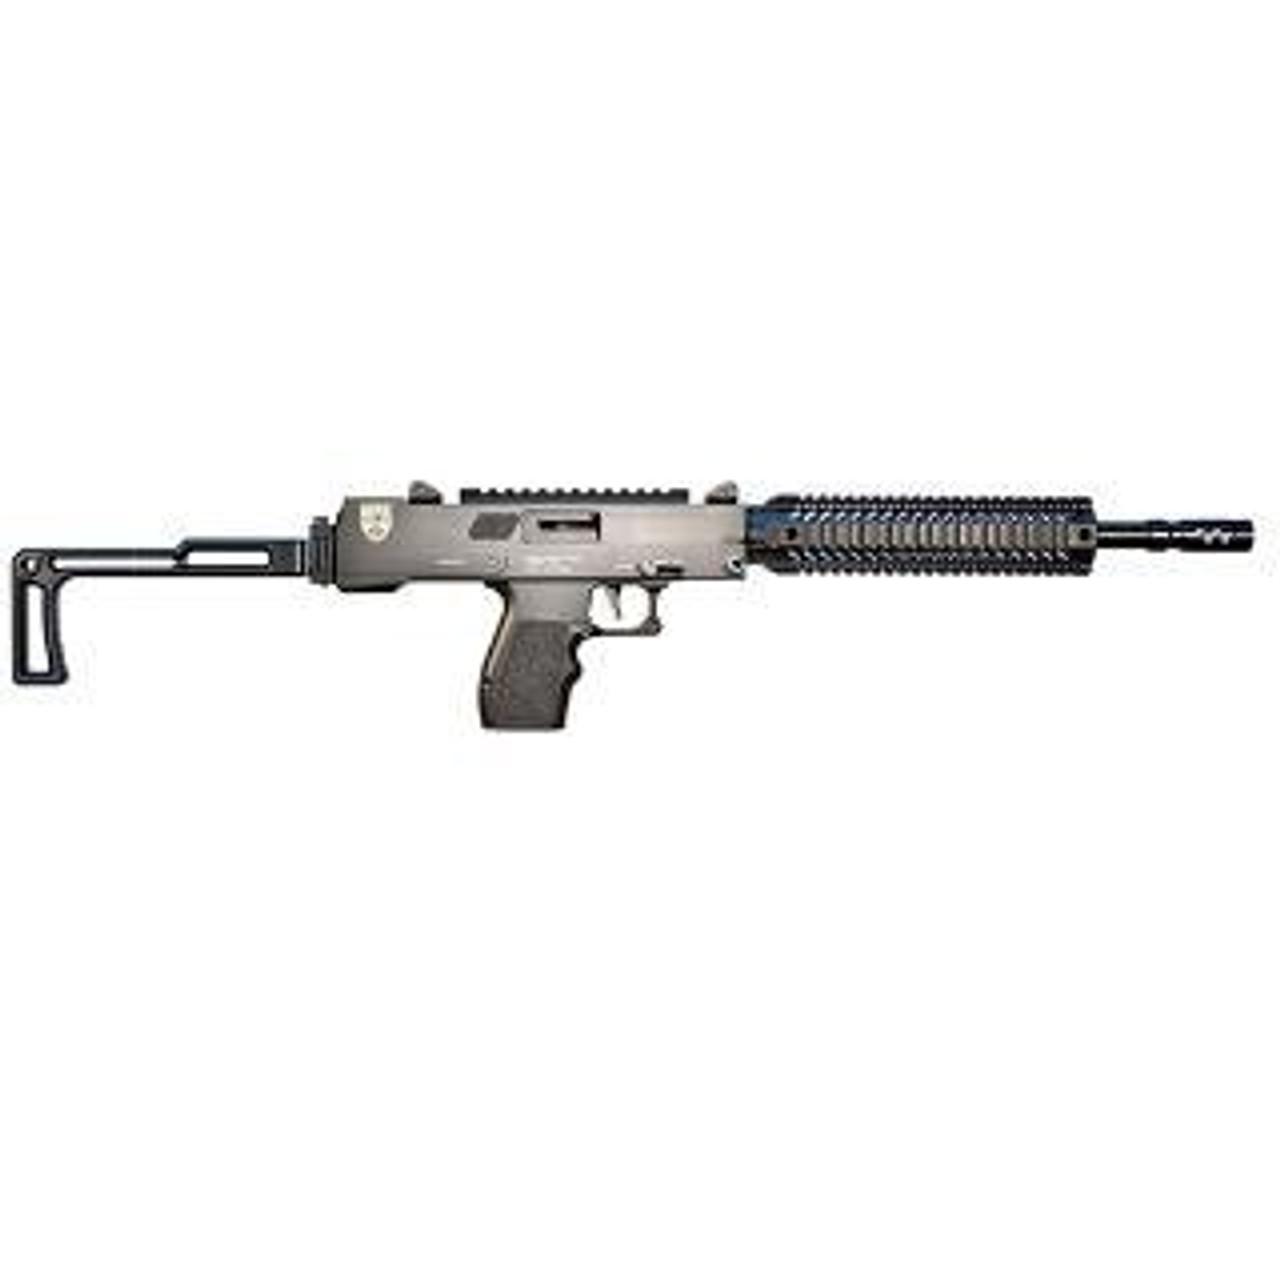 Masterpiece Arms Defender DMG CALIFORNIA LEGAL -  5.7x28